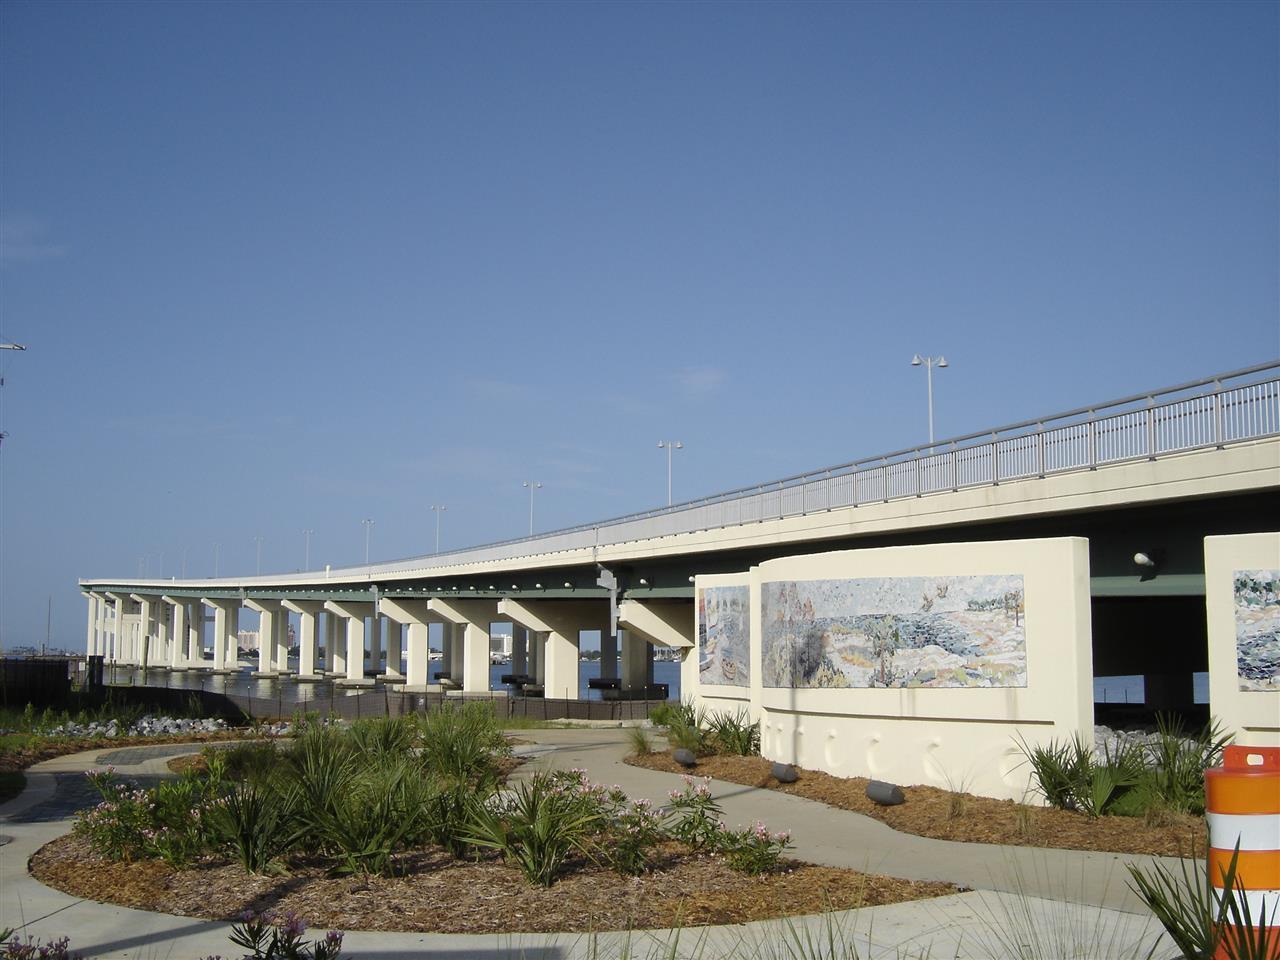 Ocean Springs, MS Biloxi Bay Bridge